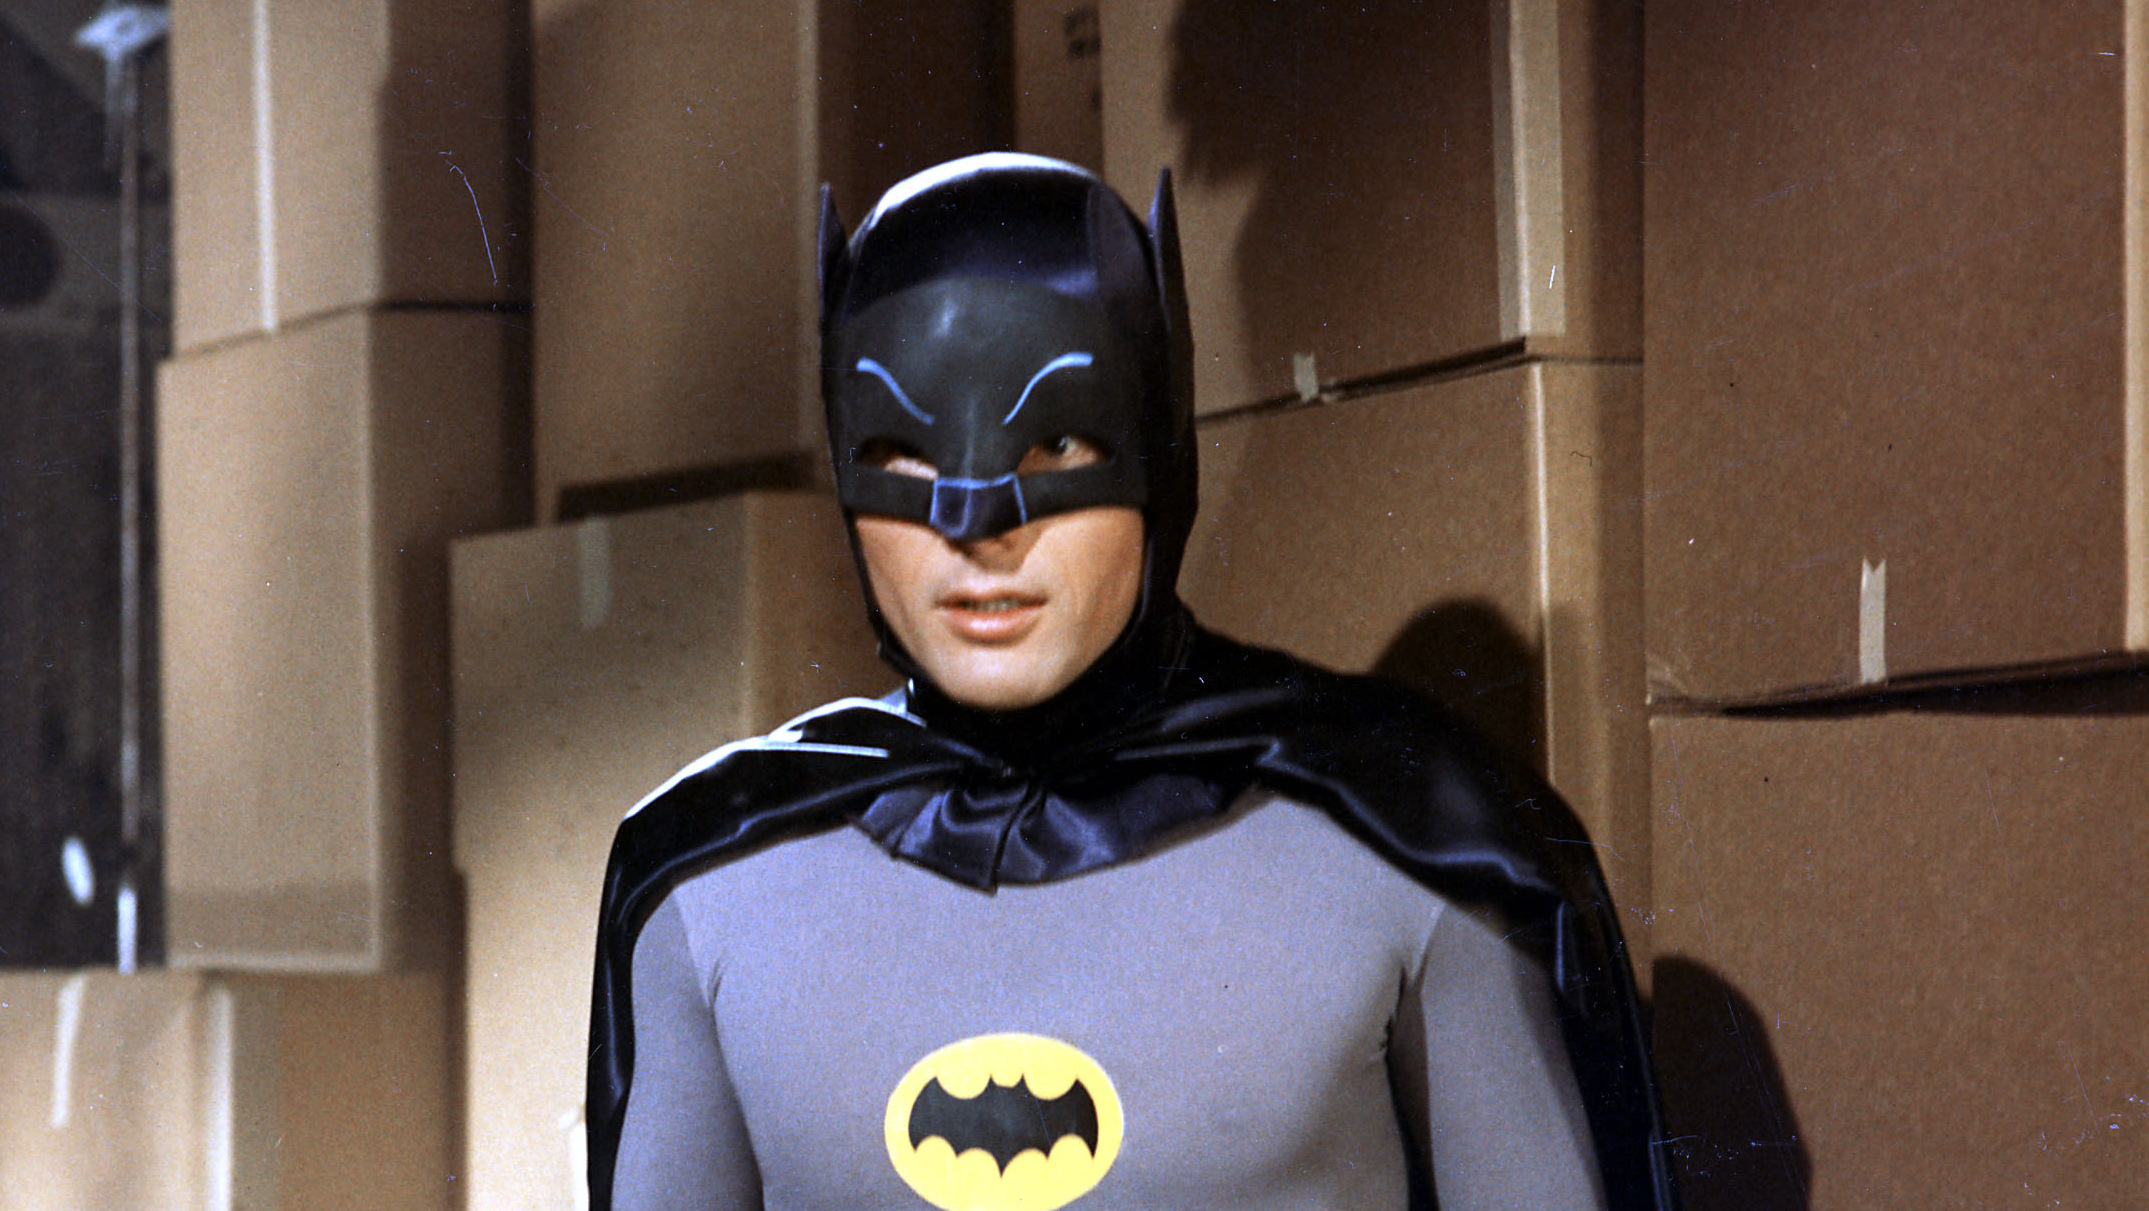 Holy Best Batman list, Robin, it's a picture of Adam West.